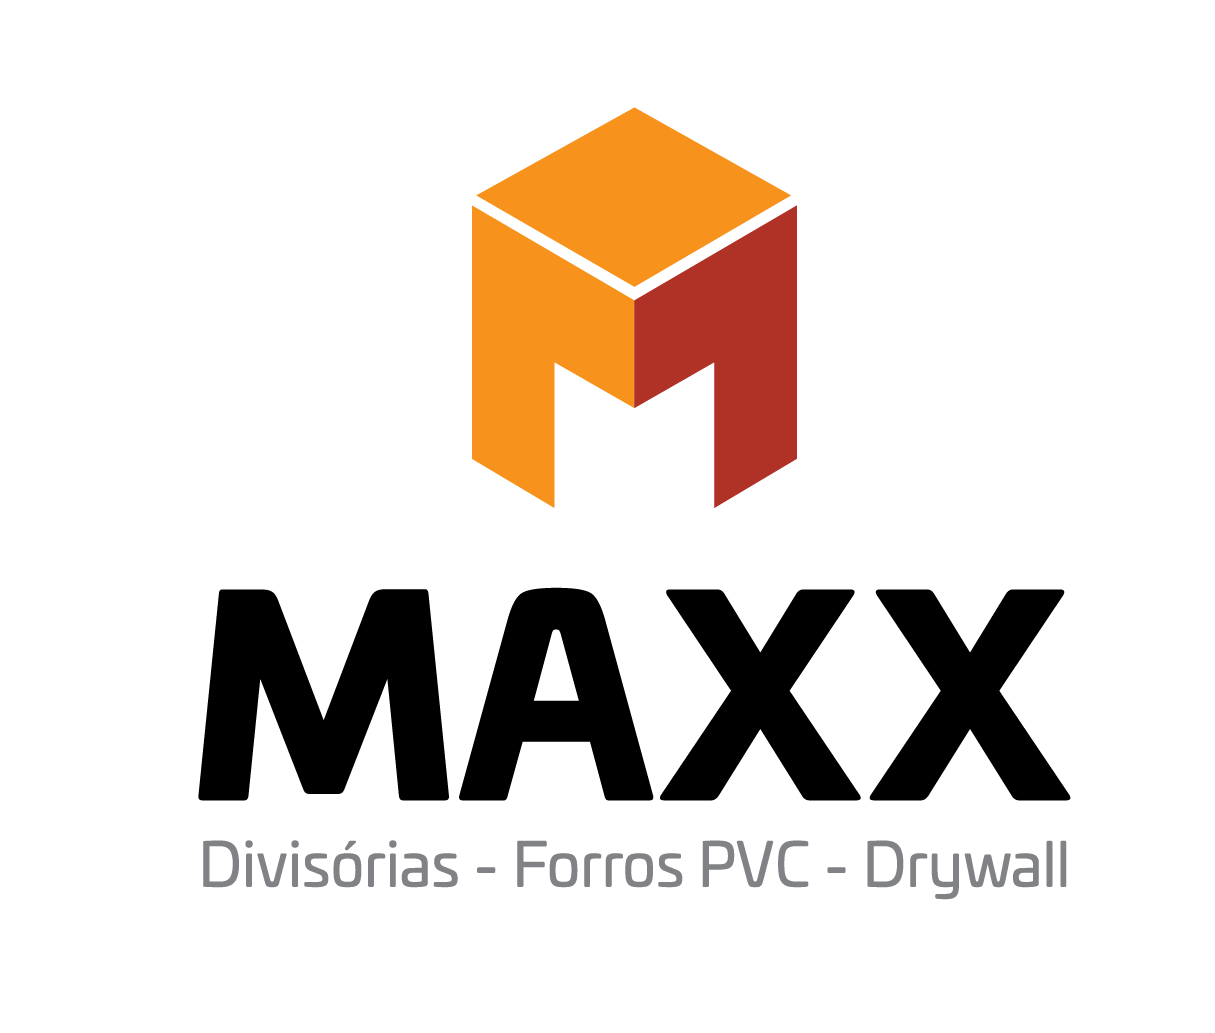 Onde Comprar Forro de Pvc com Isolamento Térmico Vila Endres - Forro de Pvc Colorido - Maxx Forro